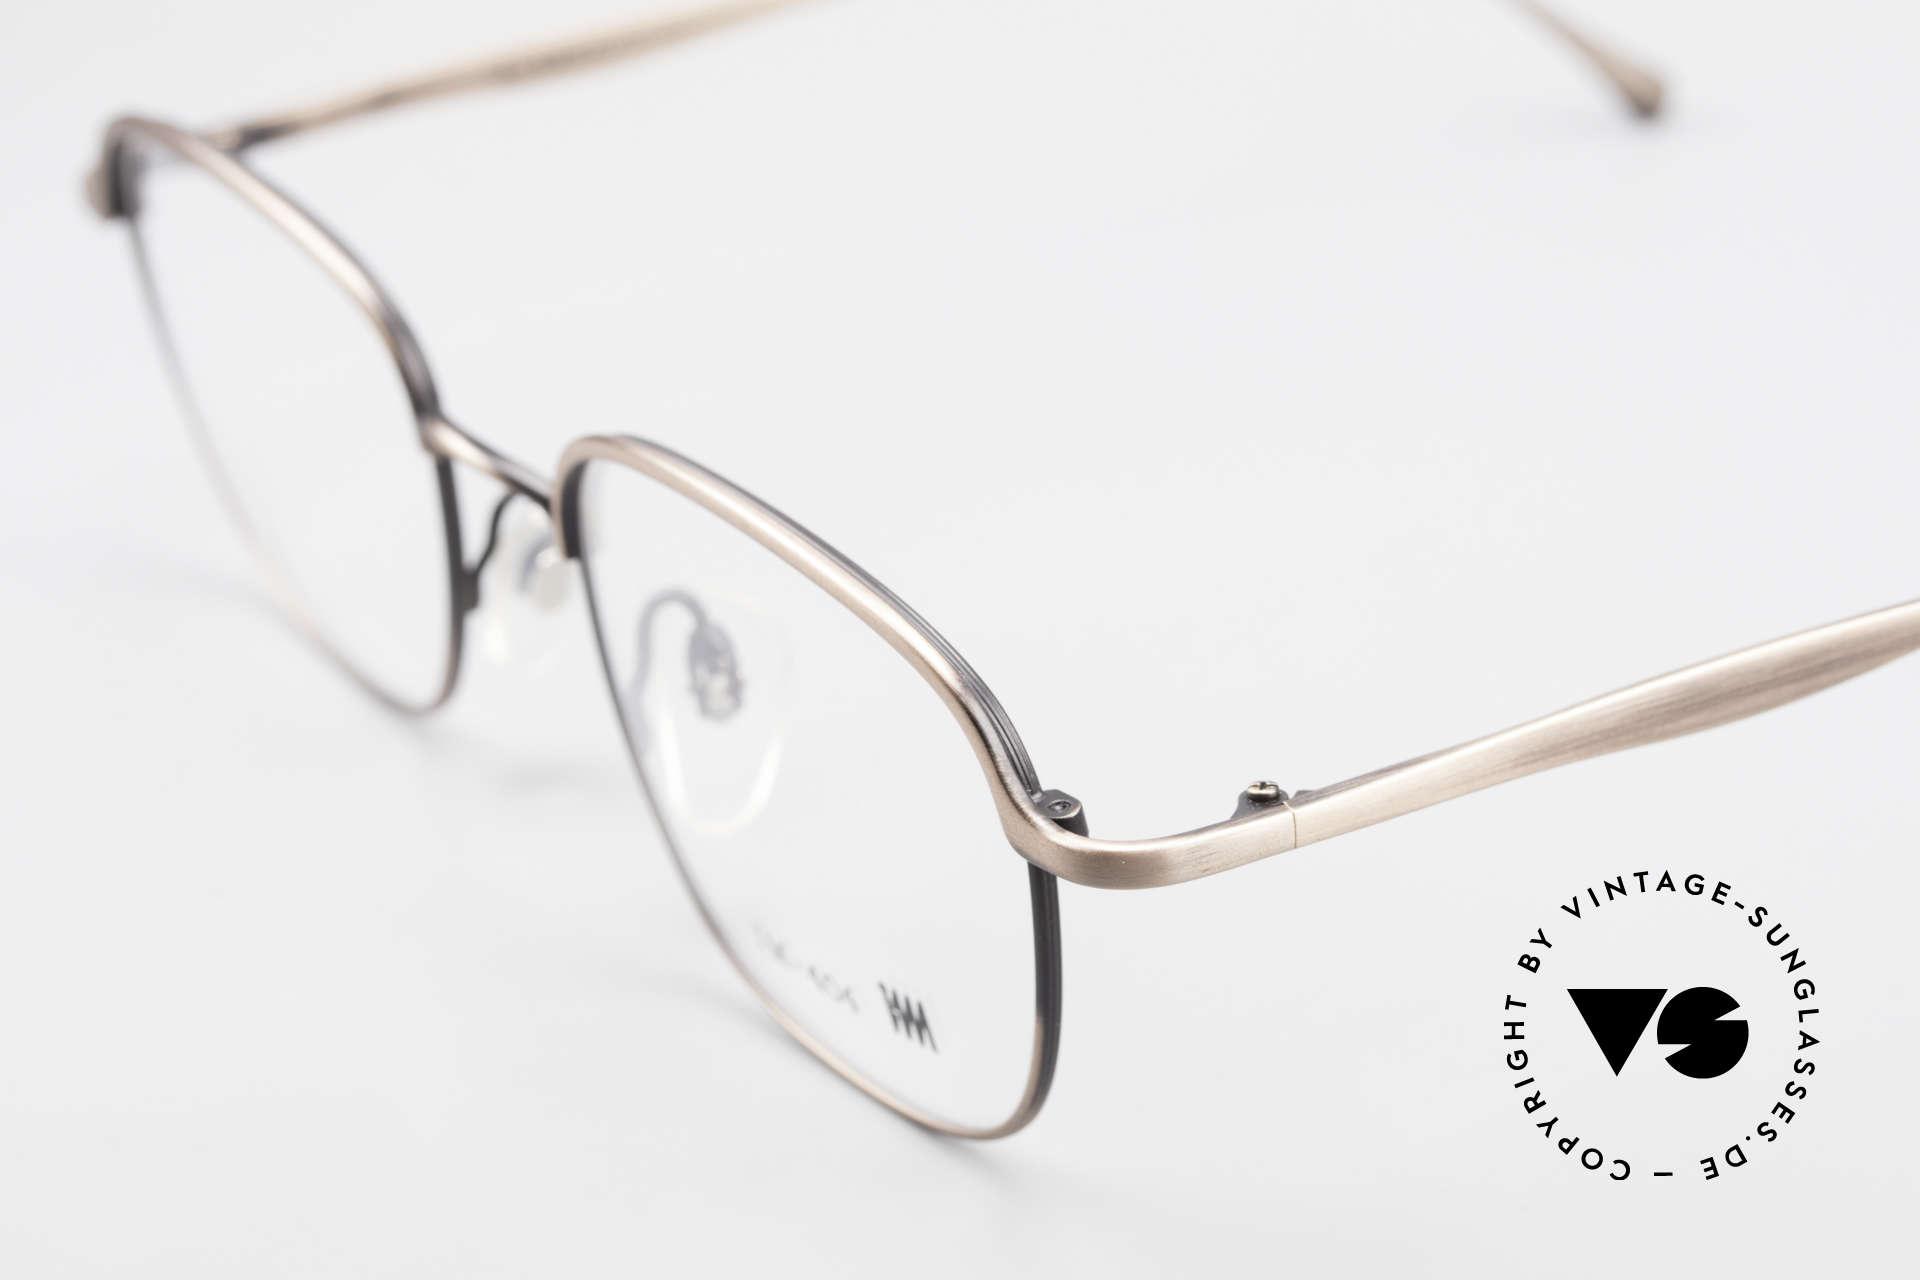 Miyake Design Studio IM404 Connoisseur Eyeglasses 90's, outstanding old craftsmanship (made in Japan), Made for Men and Women